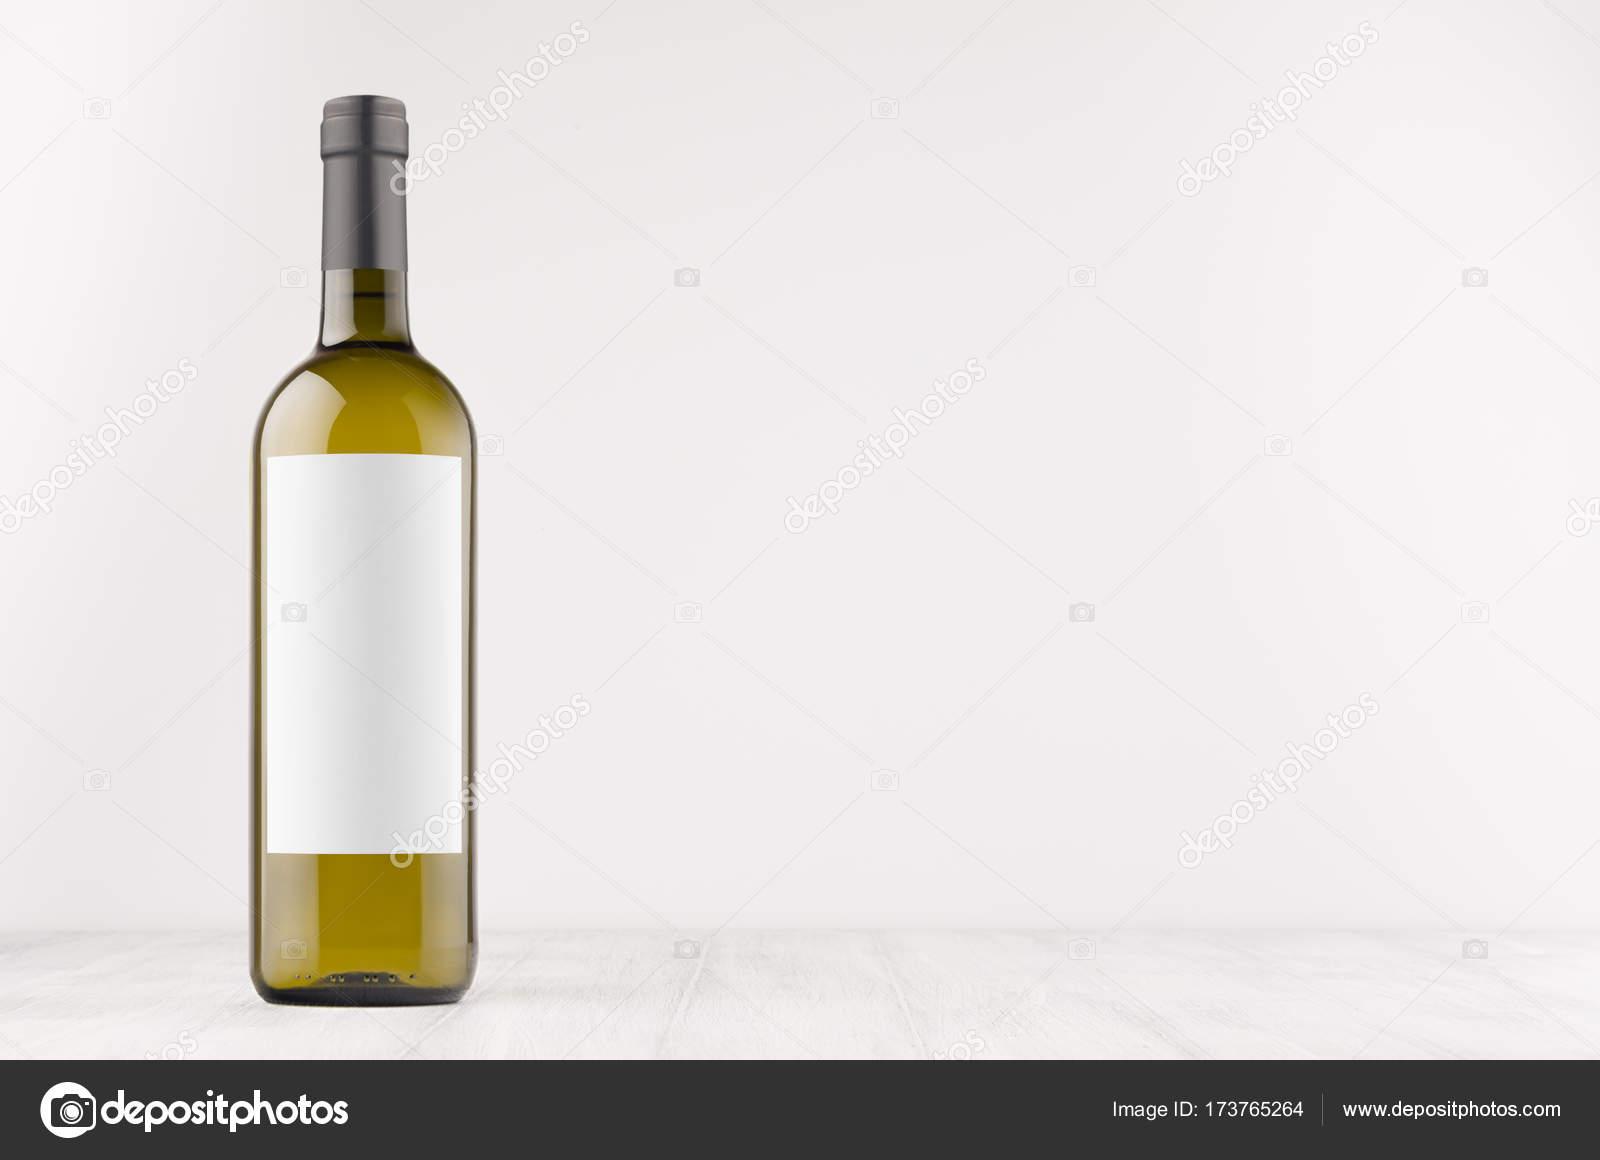 green wine bottle with blank white label on white wooden board mock